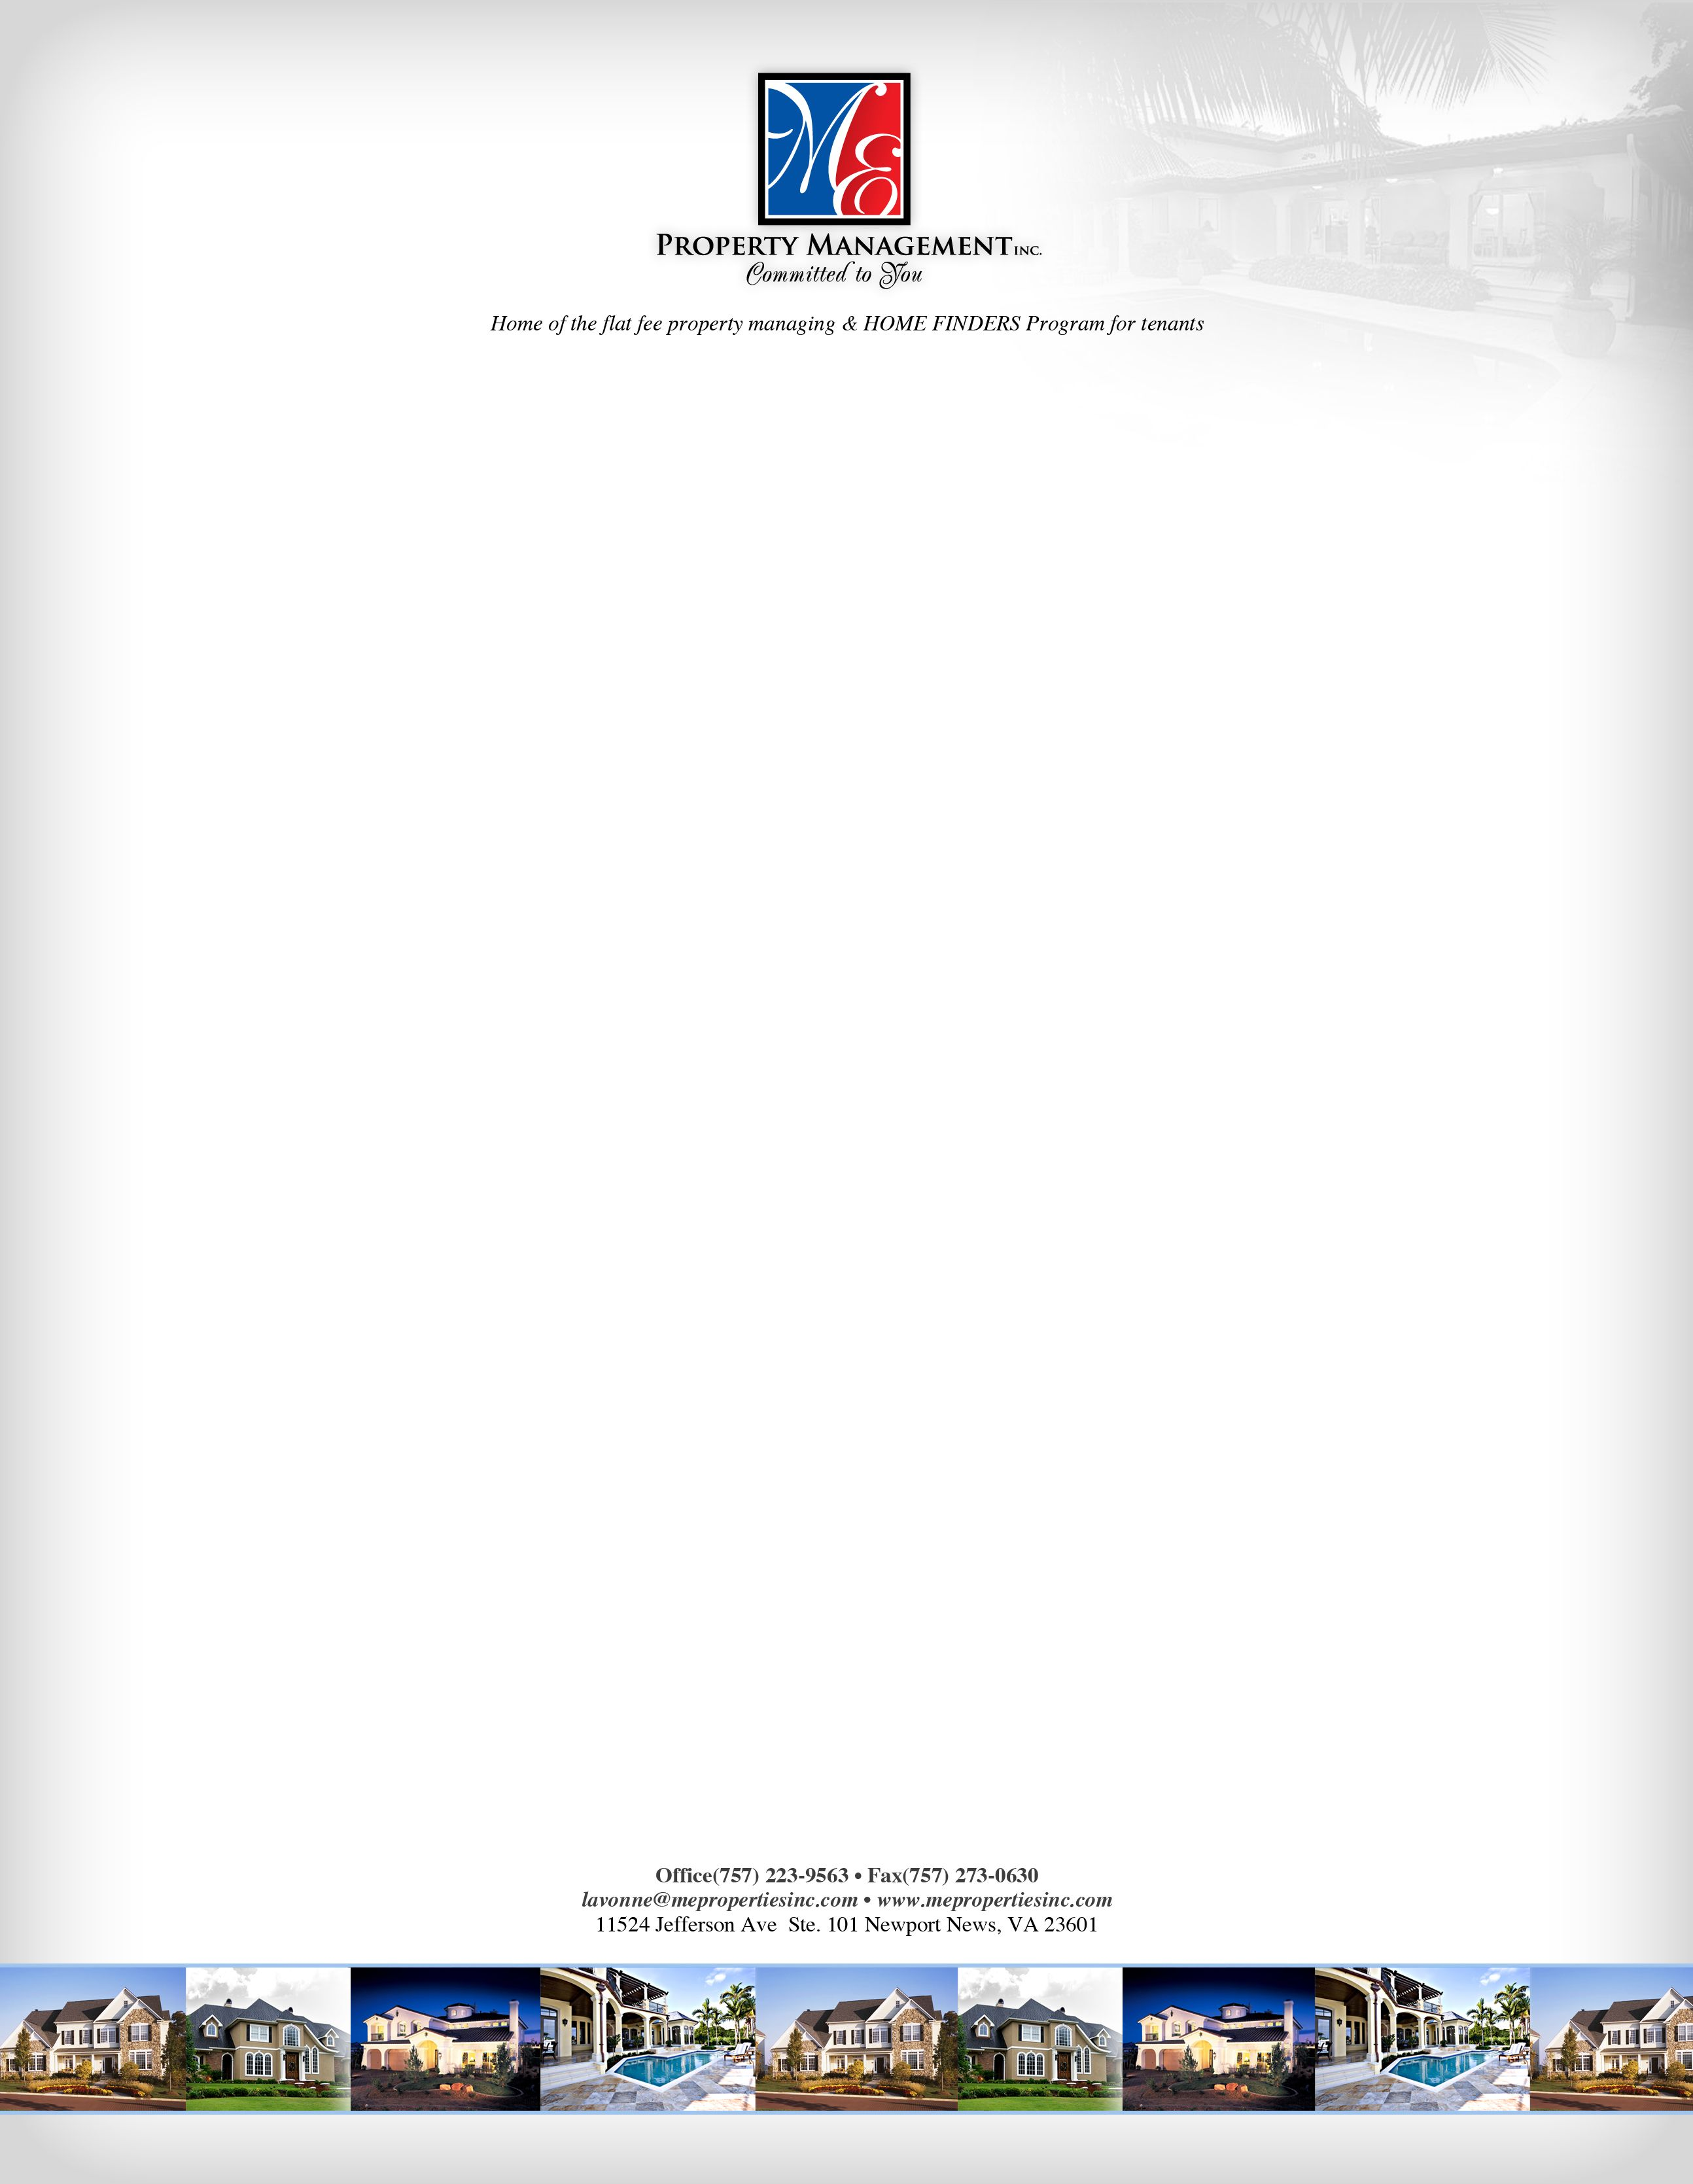 Letterhead samples letterhead designs pinterest letterhead letterhead samples spiritdancerdesigns Choice Image